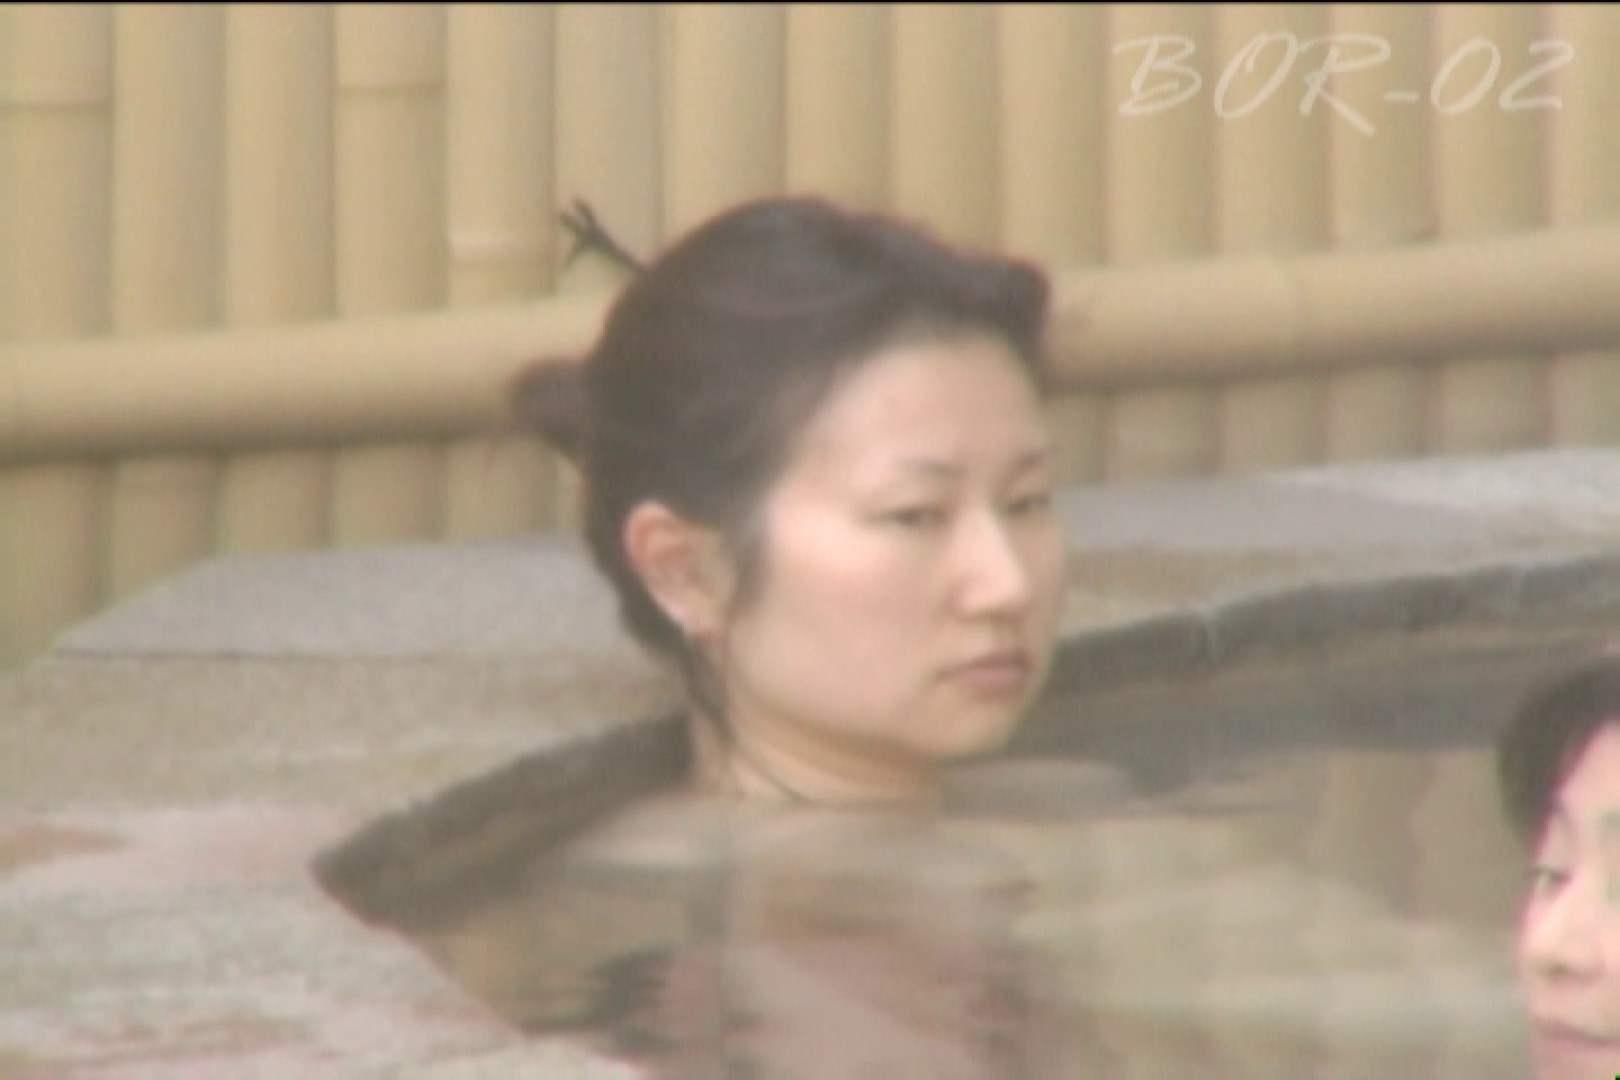 Aquaな露天風呂Vol.477 盗撮シリーズ | 露天風呂編  104PIX 71